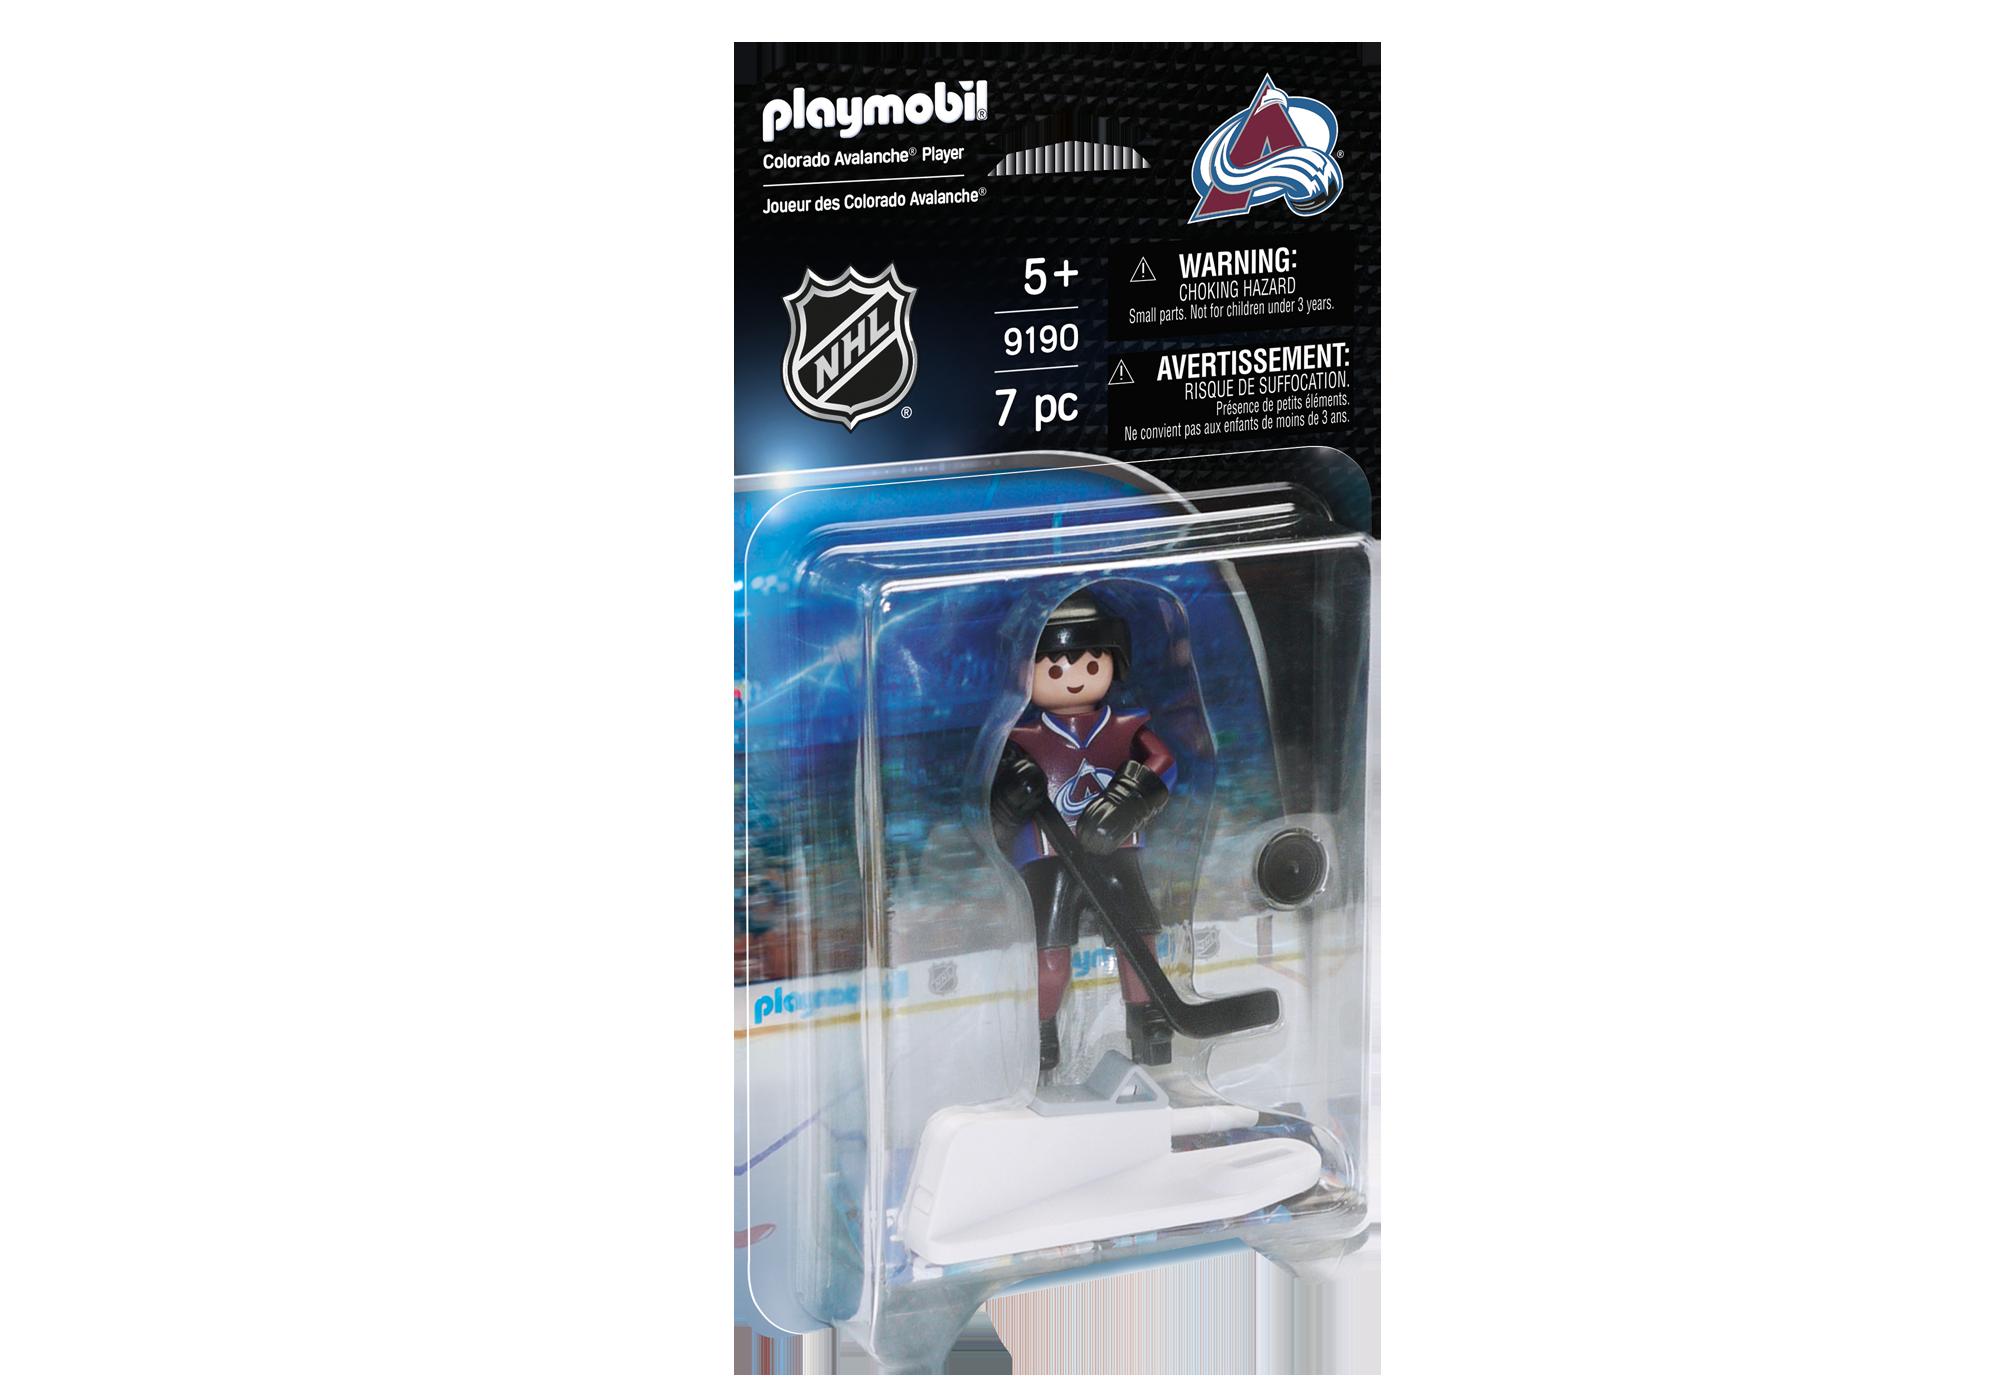 http://media.playmobil.com/i/playmobil/9190_product_box_front/NHL® Colorado Avanlanche® Player